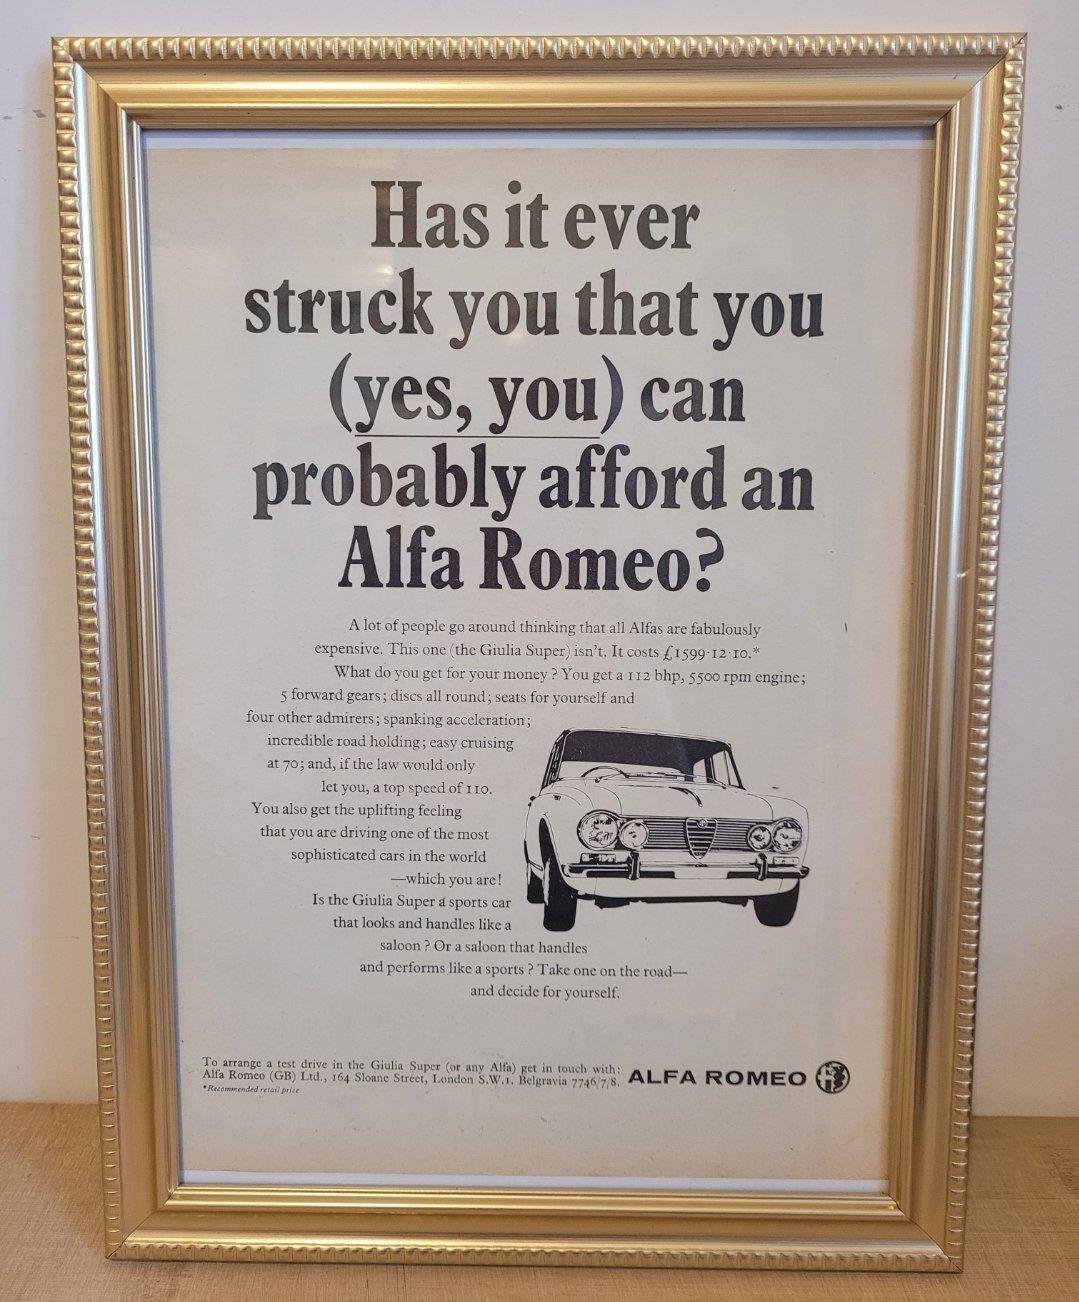 Picture of 1983 Original 1967 Alfa Giulia Super Framed Advert